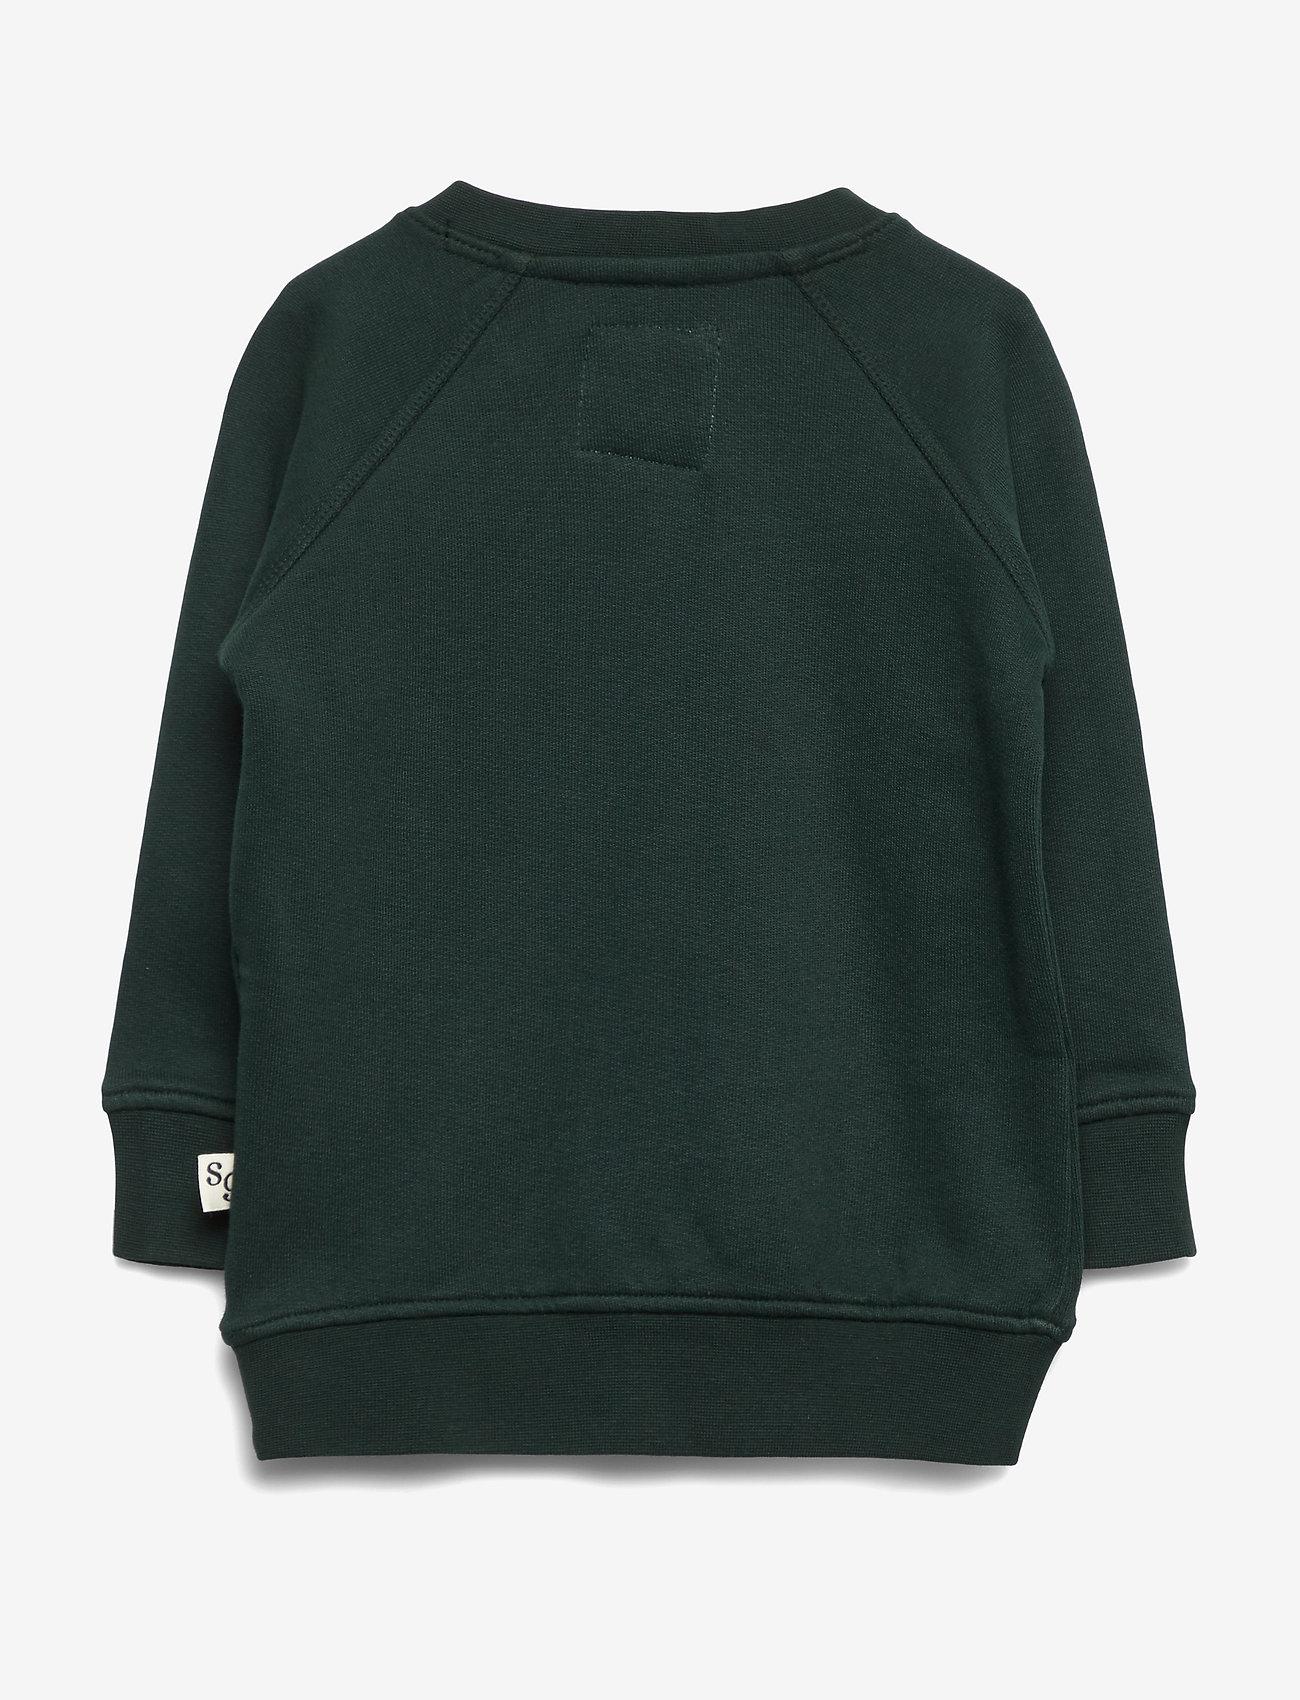 Alexi Sweatshirt (Pine Grove Mini Owl) (31.96 €) - Soft Gallery pVCZR